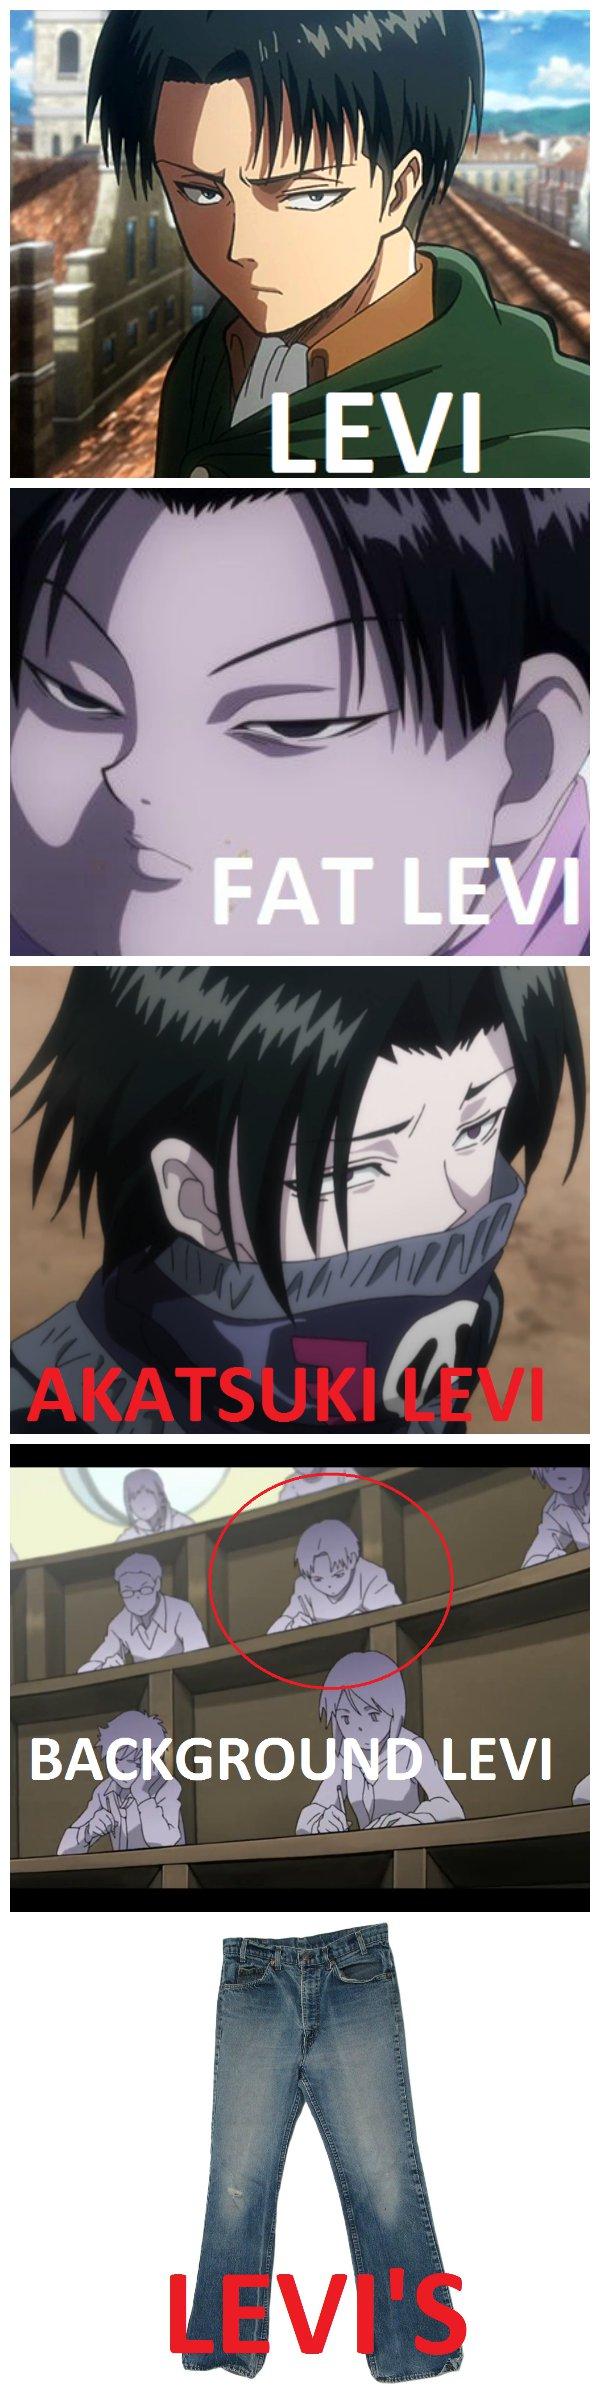 Pin By Kenya On Shingeki No Meme Attack On Titan Attack On Titan Funny Funny Anime Pics